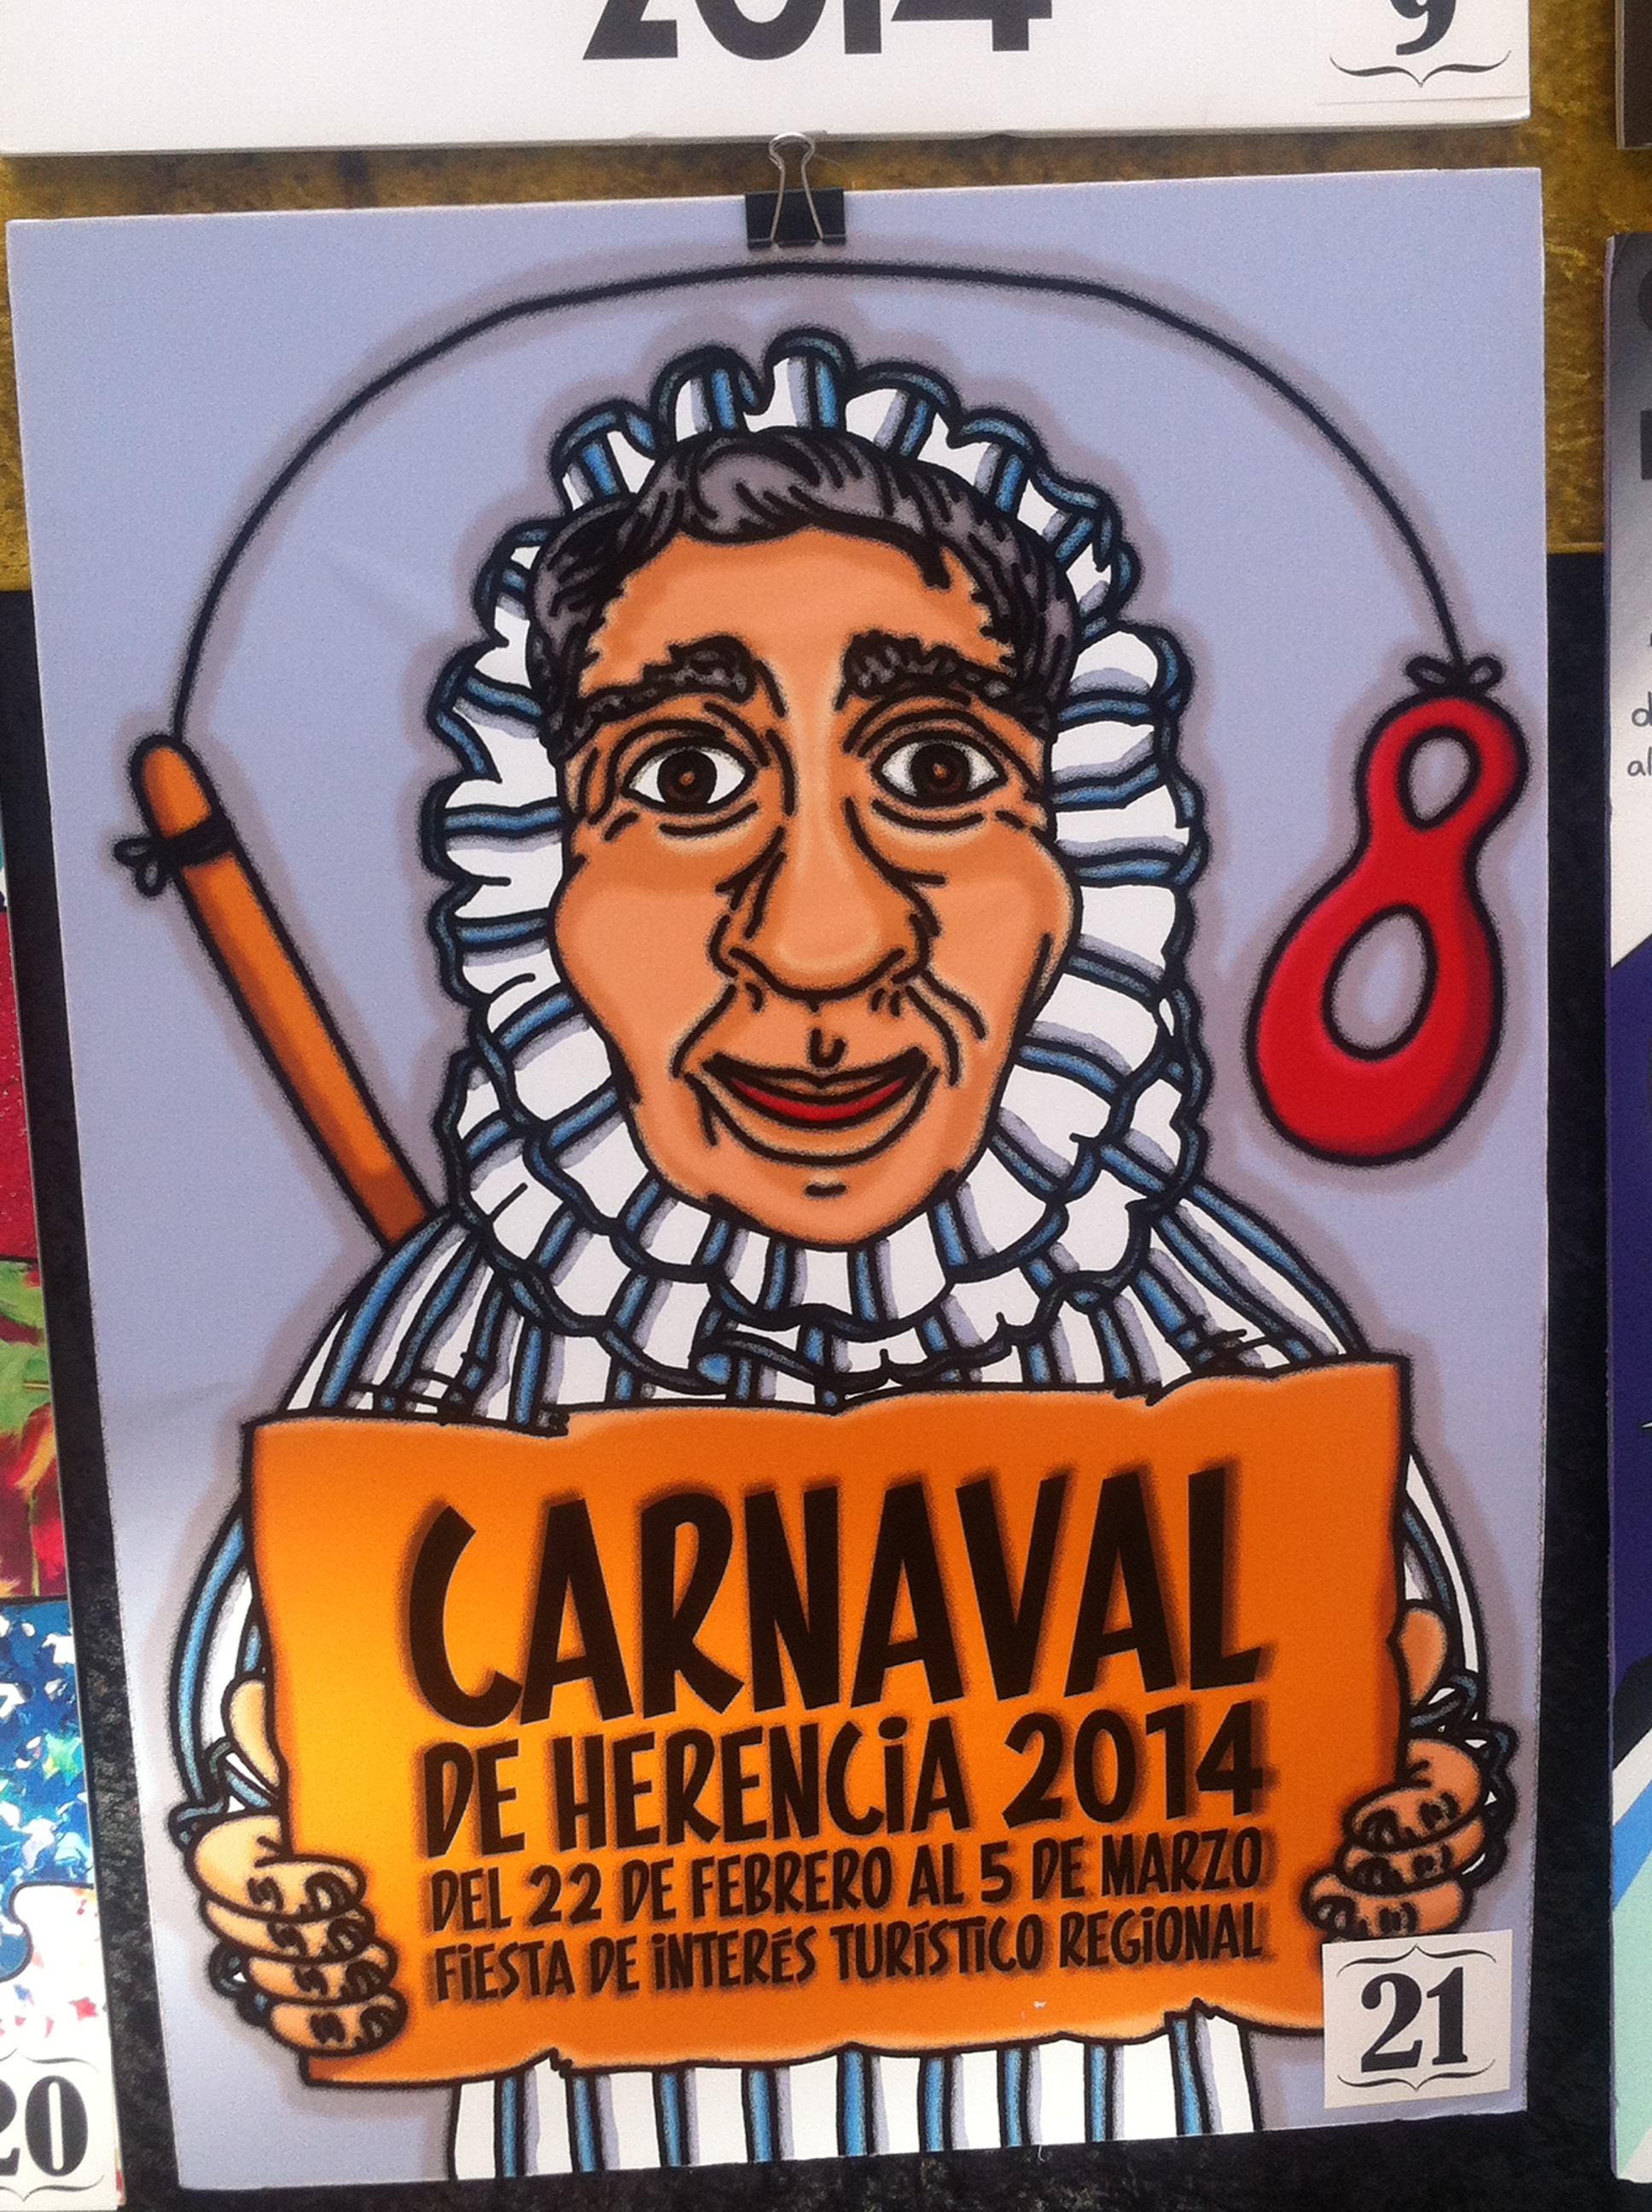 Concurso Carteles Carnaval 2014 (21)